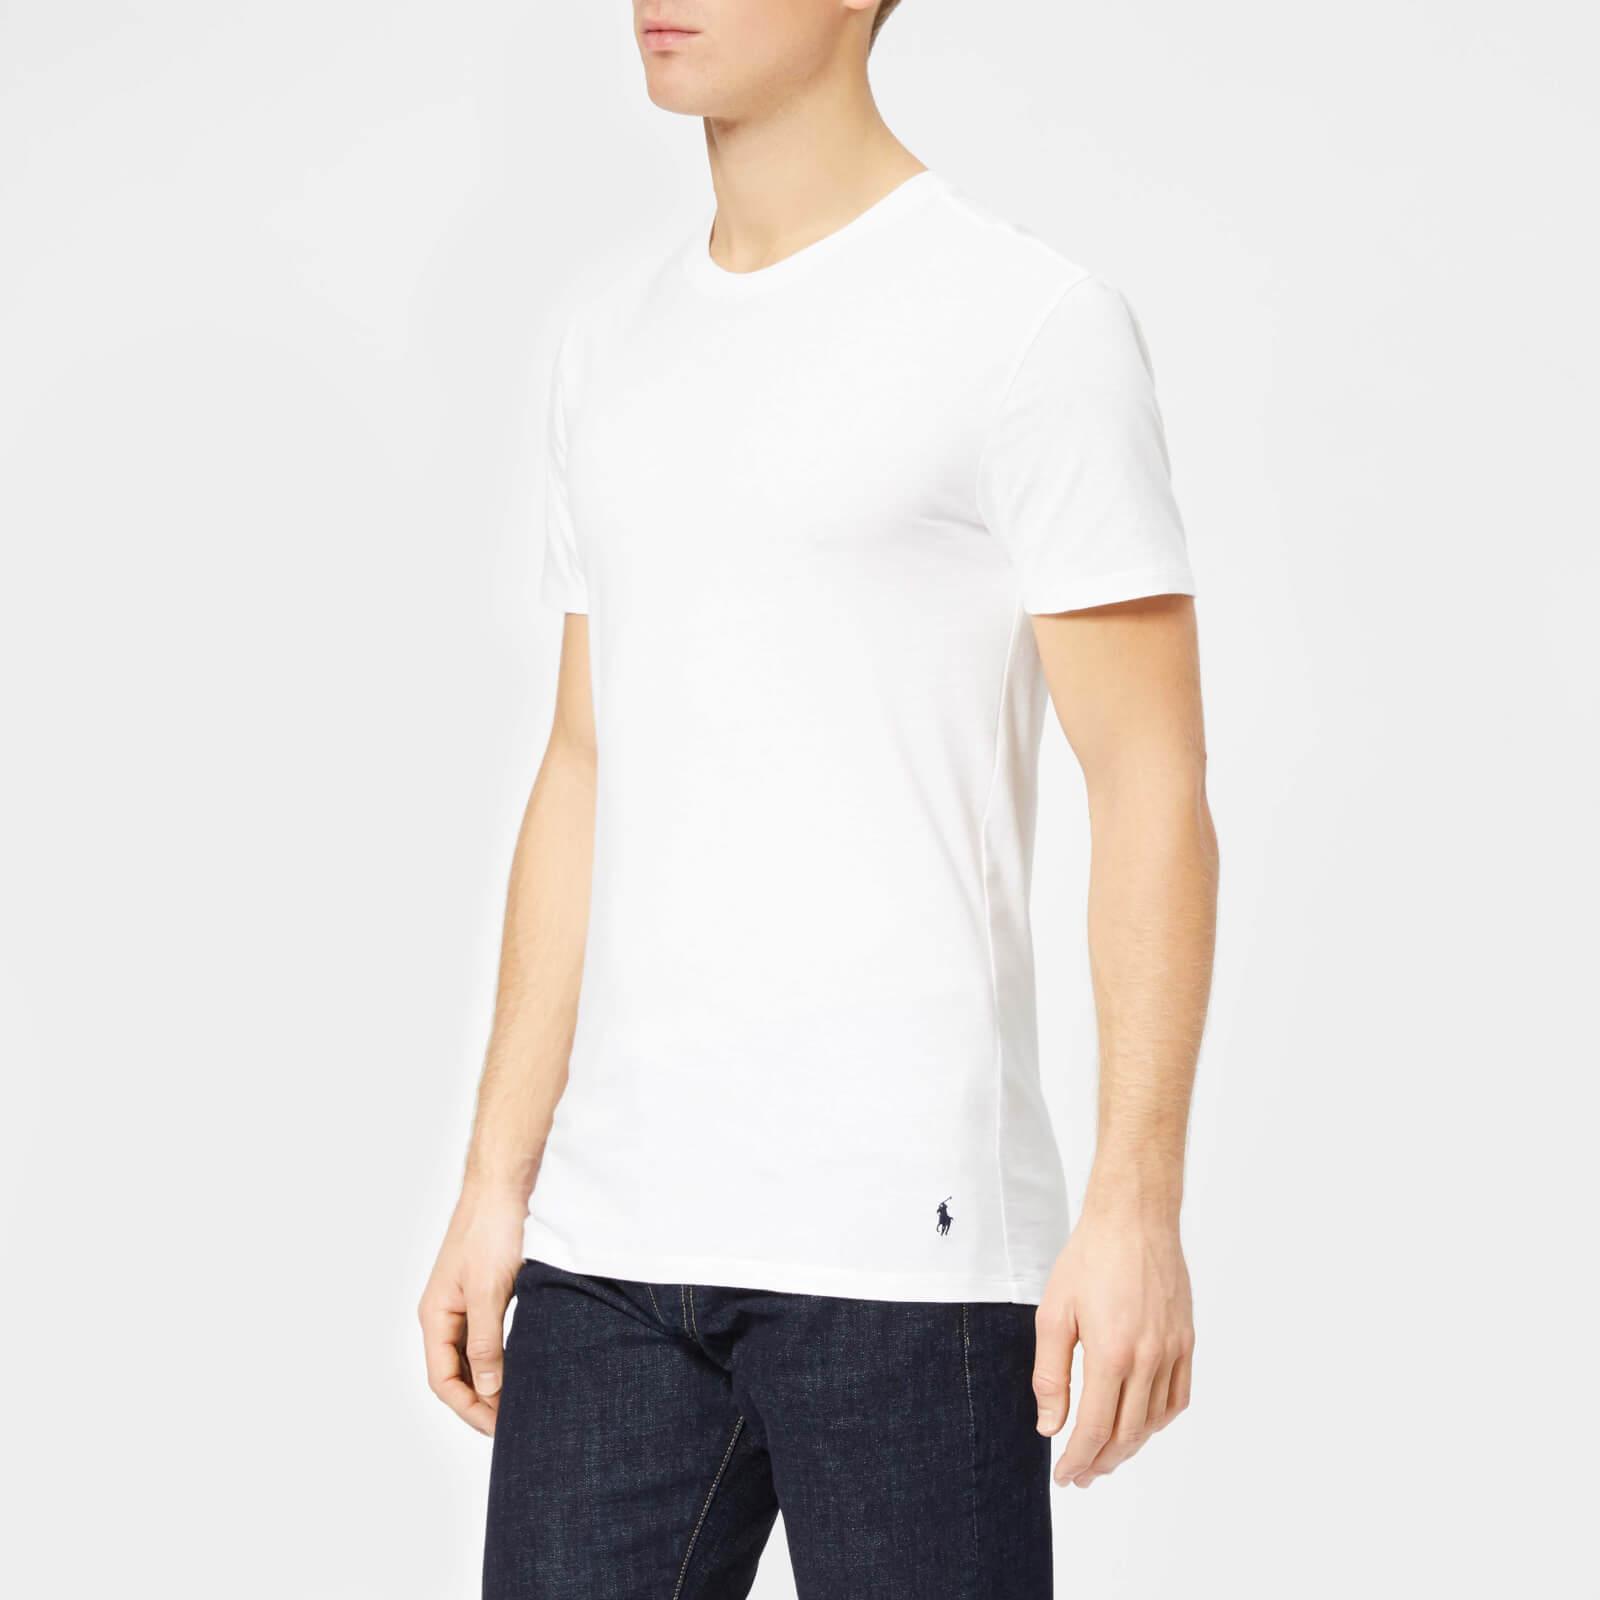 1031cd6ea2 Polo Ralph Lauren Men's 3 Pack Short Sleeve Crew Neck T-Shirt -  White/Black/Andover Heather